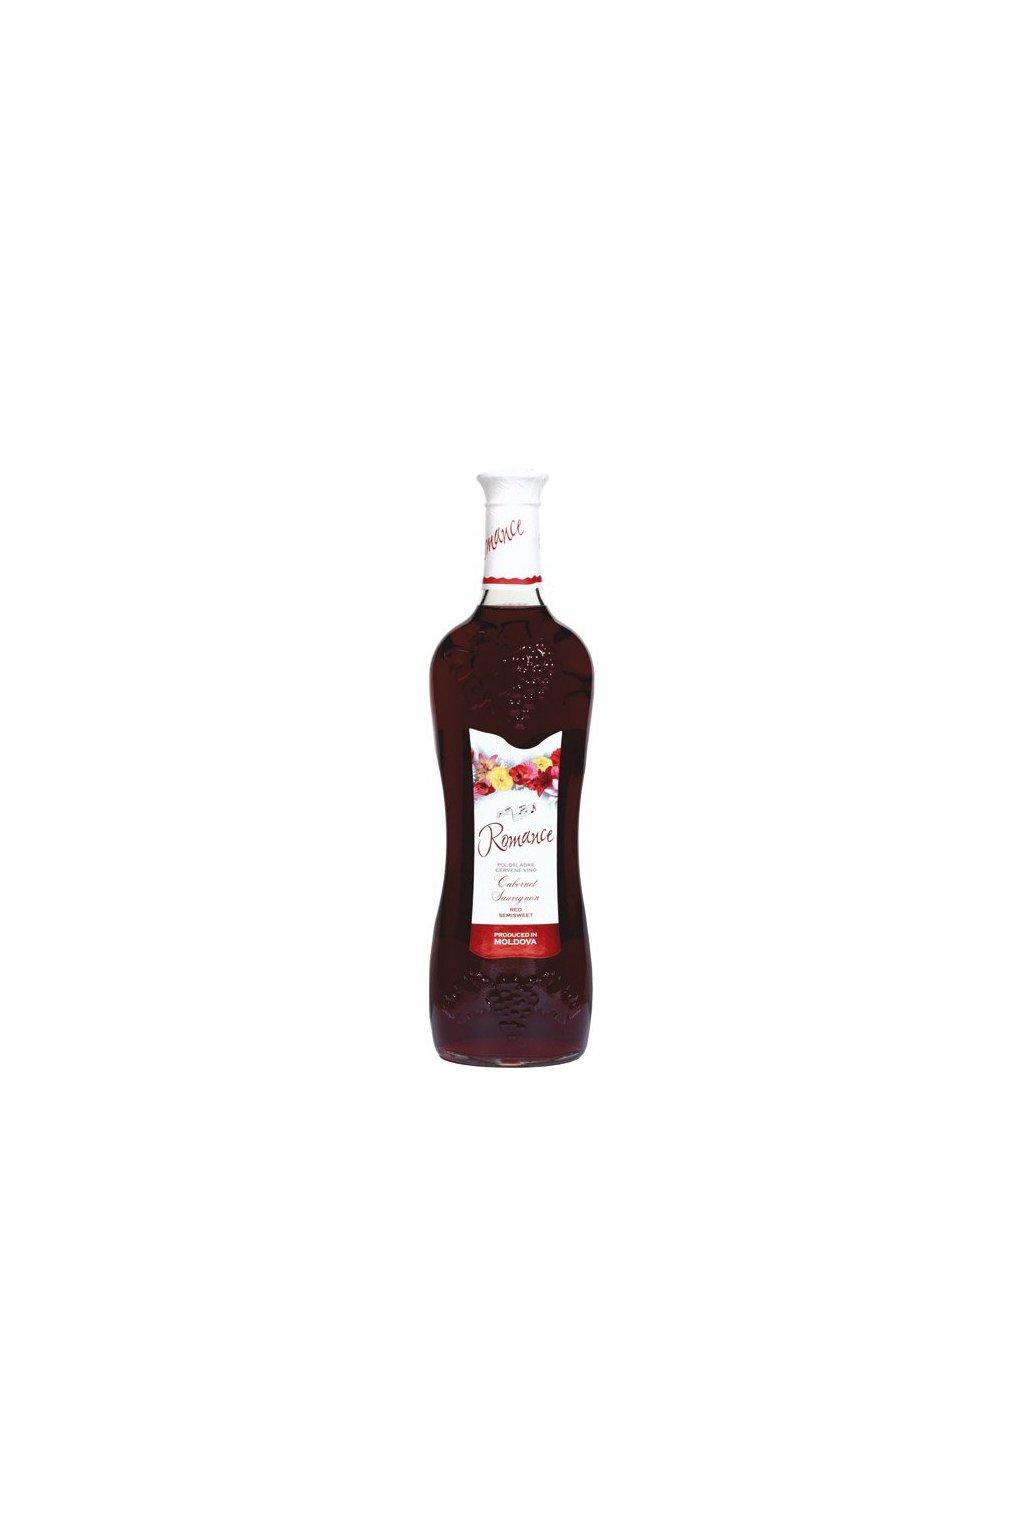 basavin romance cabernet sauvignon